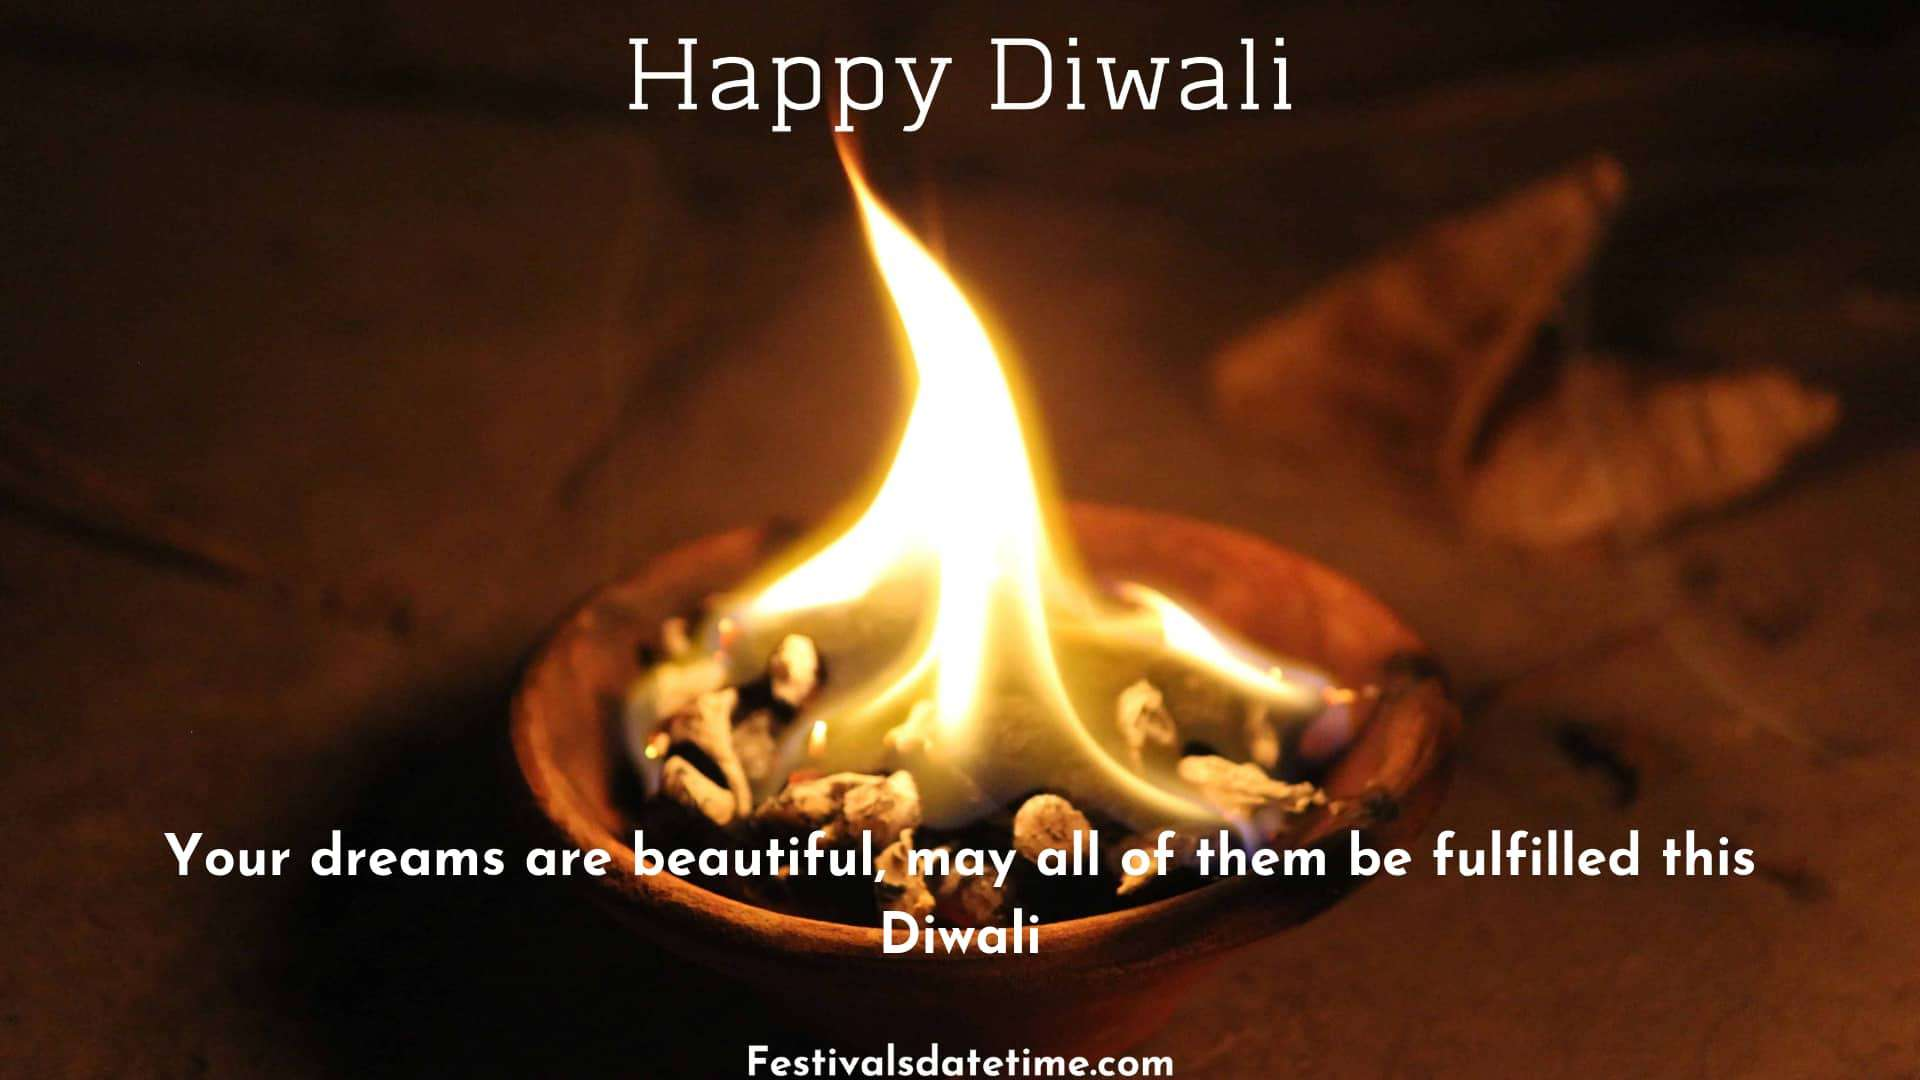 diwali_decoration_images